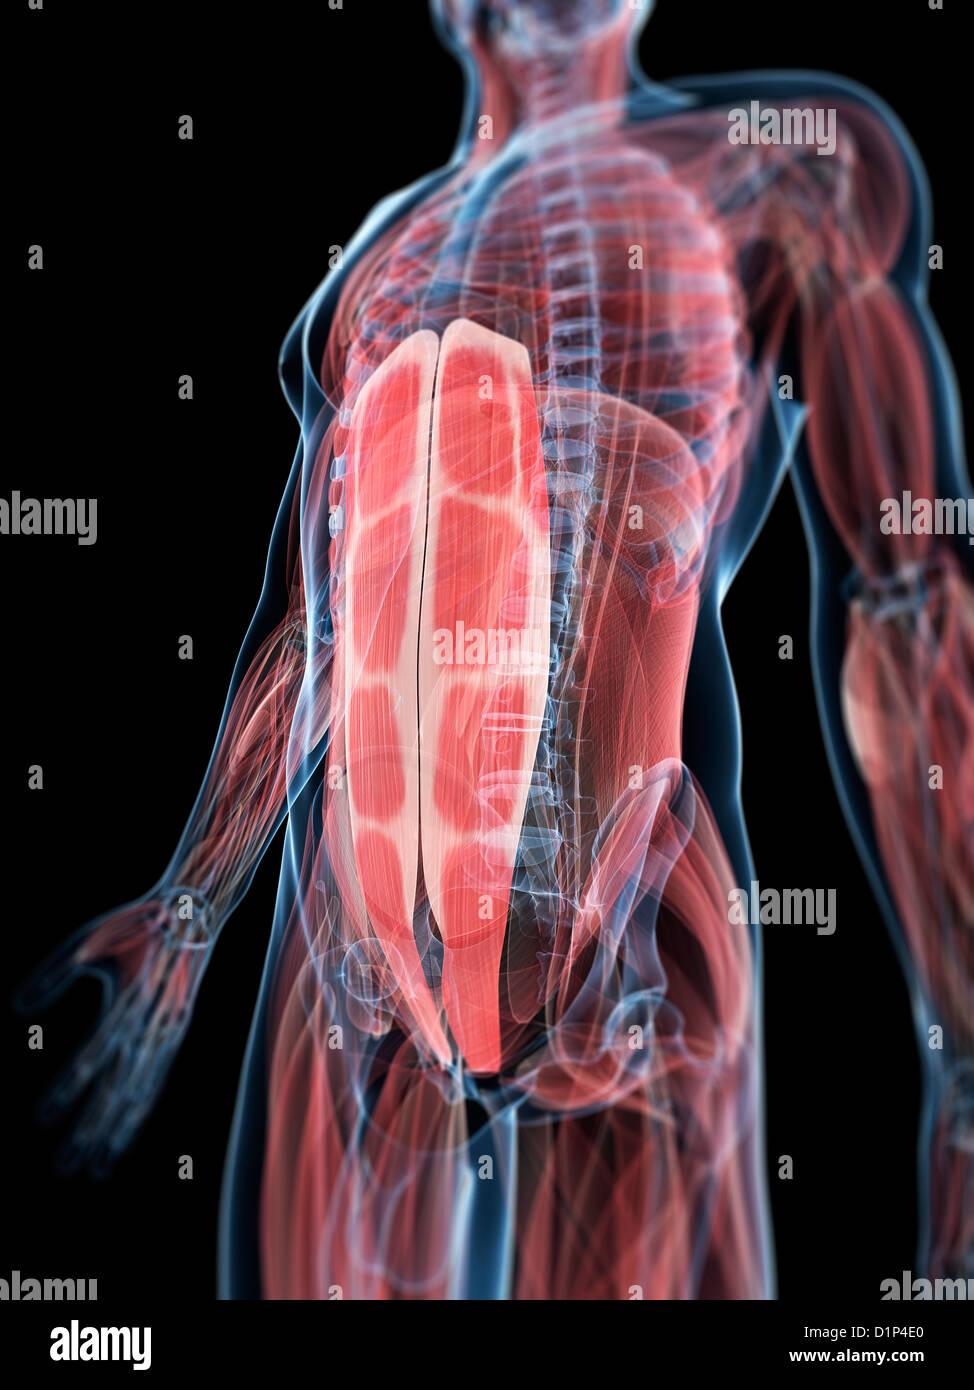 Abdominal Muscles Artwork Stock Photo 52732232 Alamy